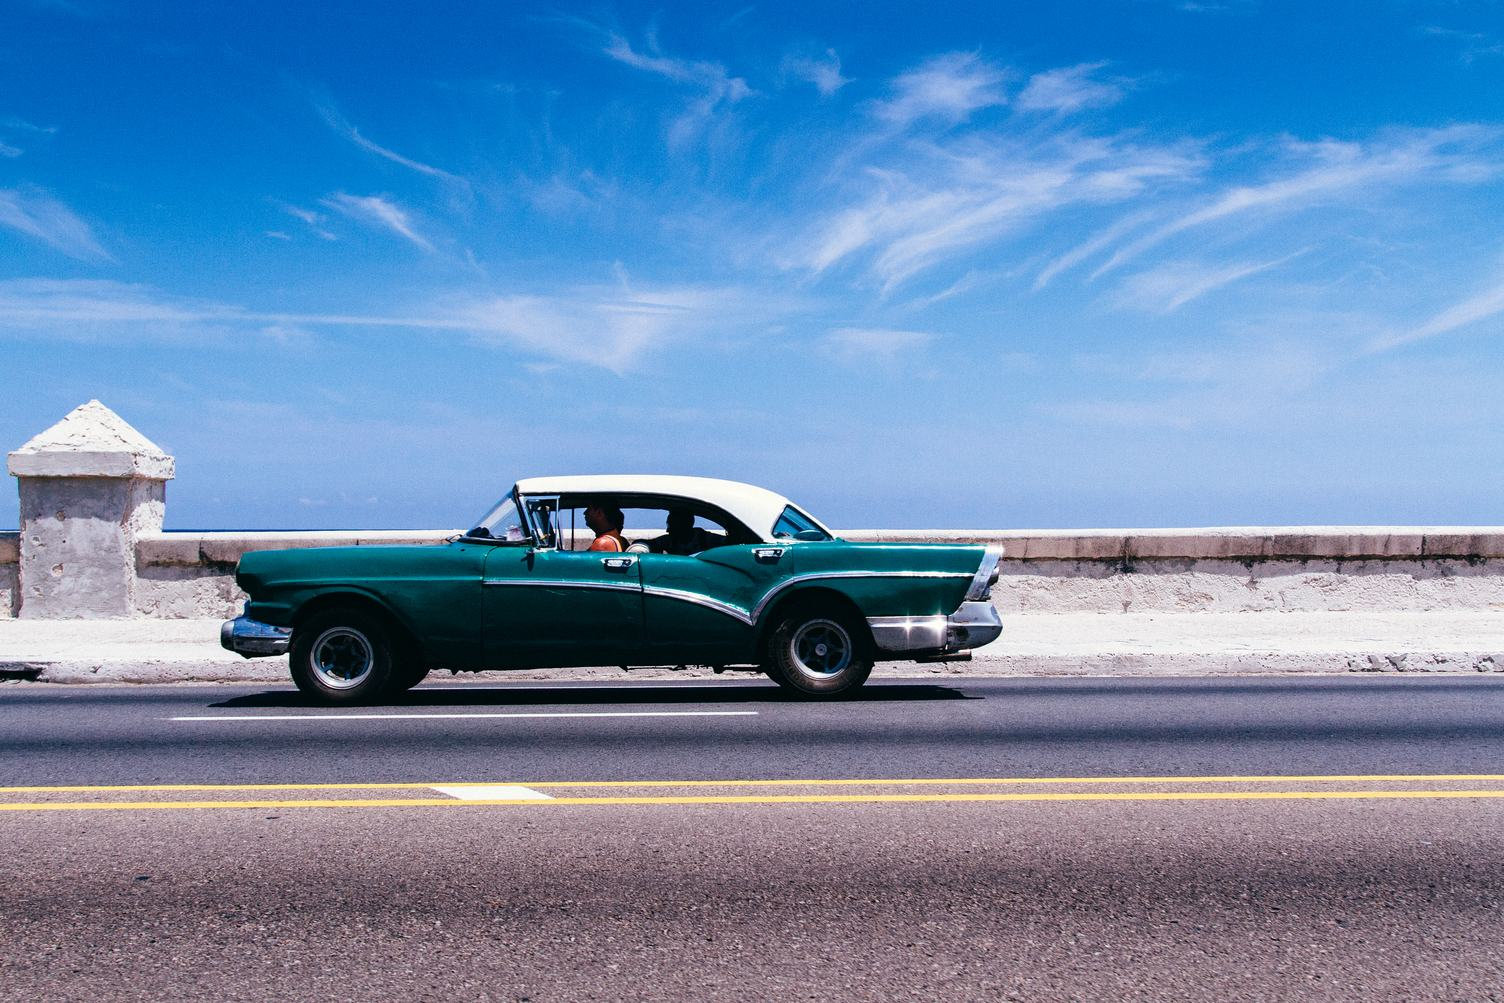 Vintage Classic American Car